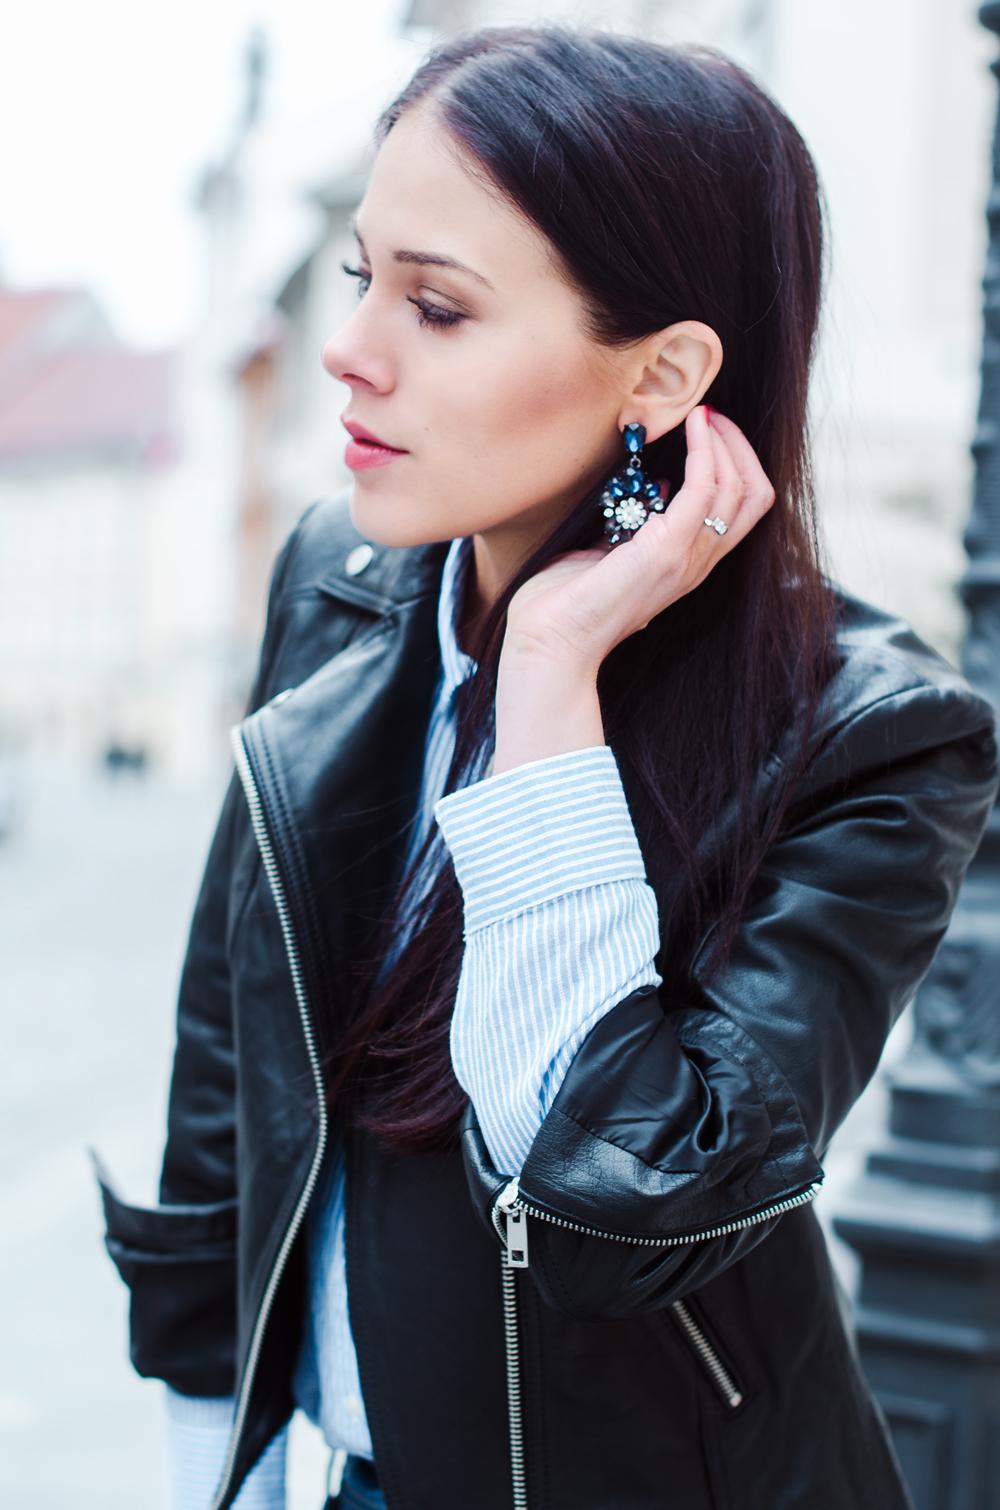 Eva Ahačevčič_Love, Eva_Diesel_leather jacket_Modni dodatki Bling bling_Crop pants 2